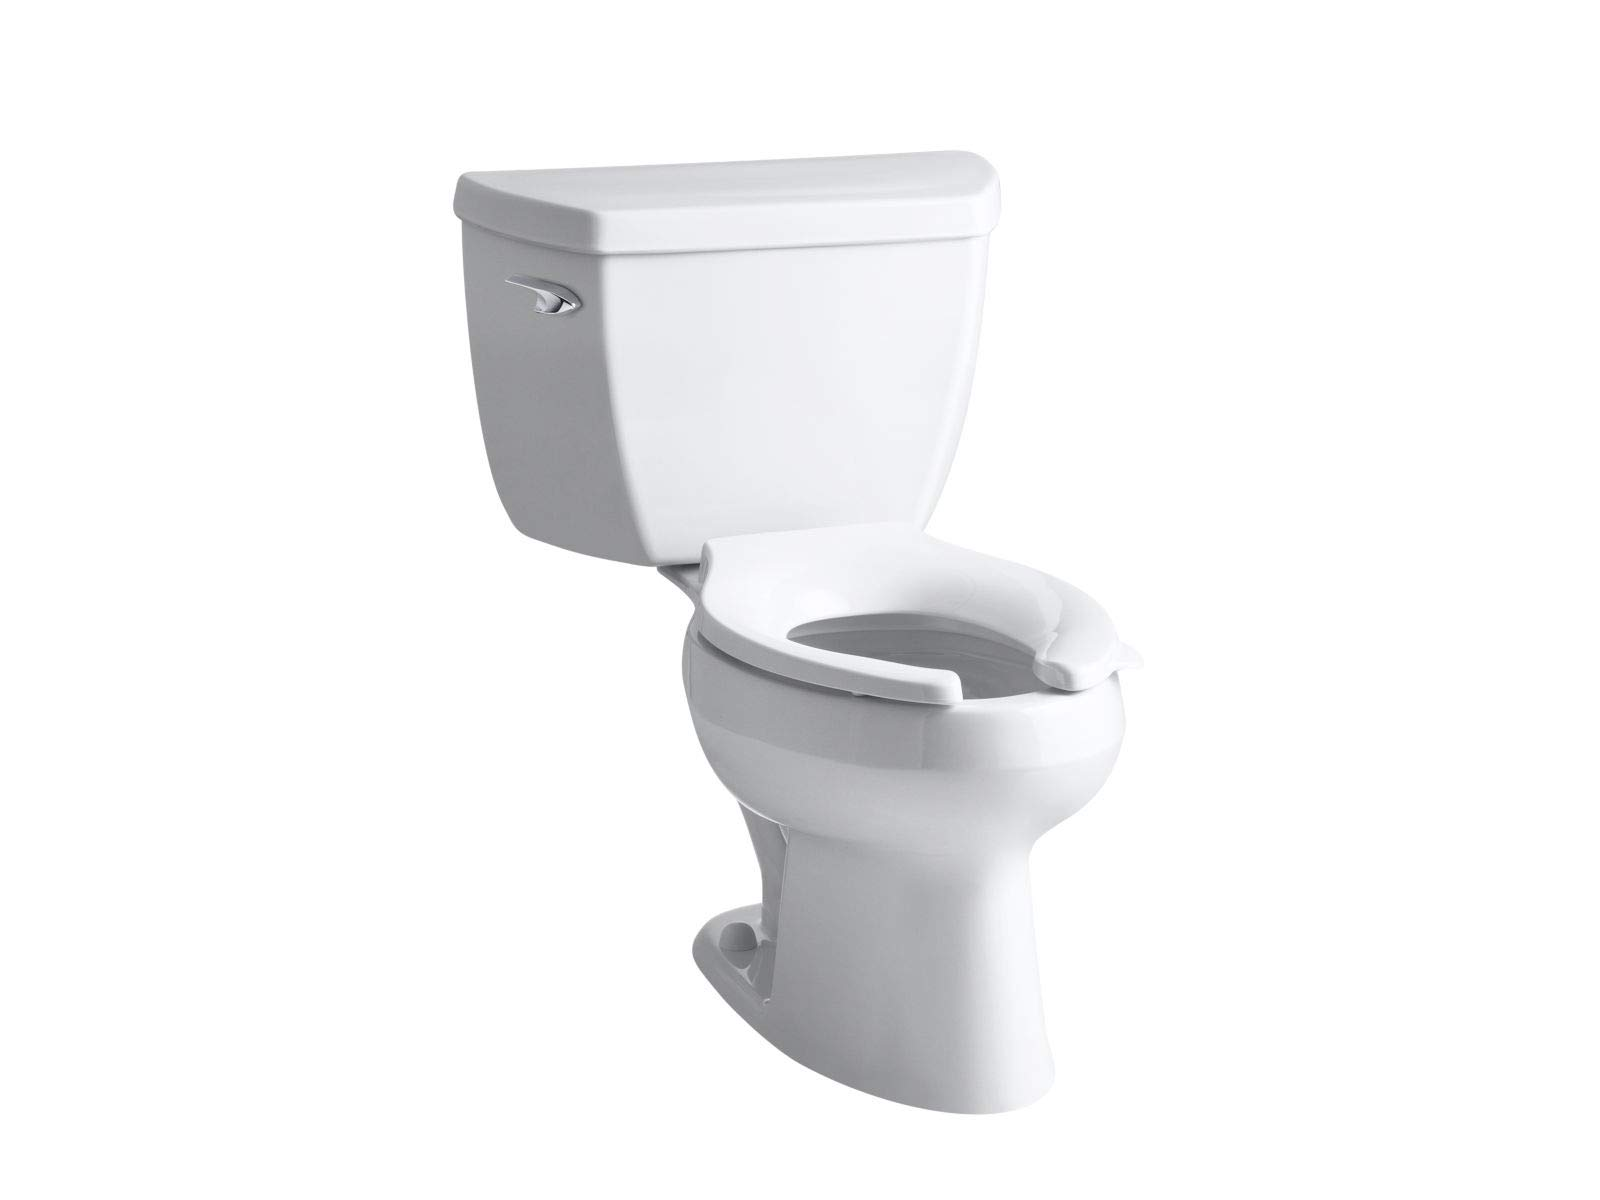 Kohler K-3531-0 Wellworth Pressure Lite Elongated 1.0 gpf Toilet with Left-Hand Trip Lever, Less Seat, White by Kohler